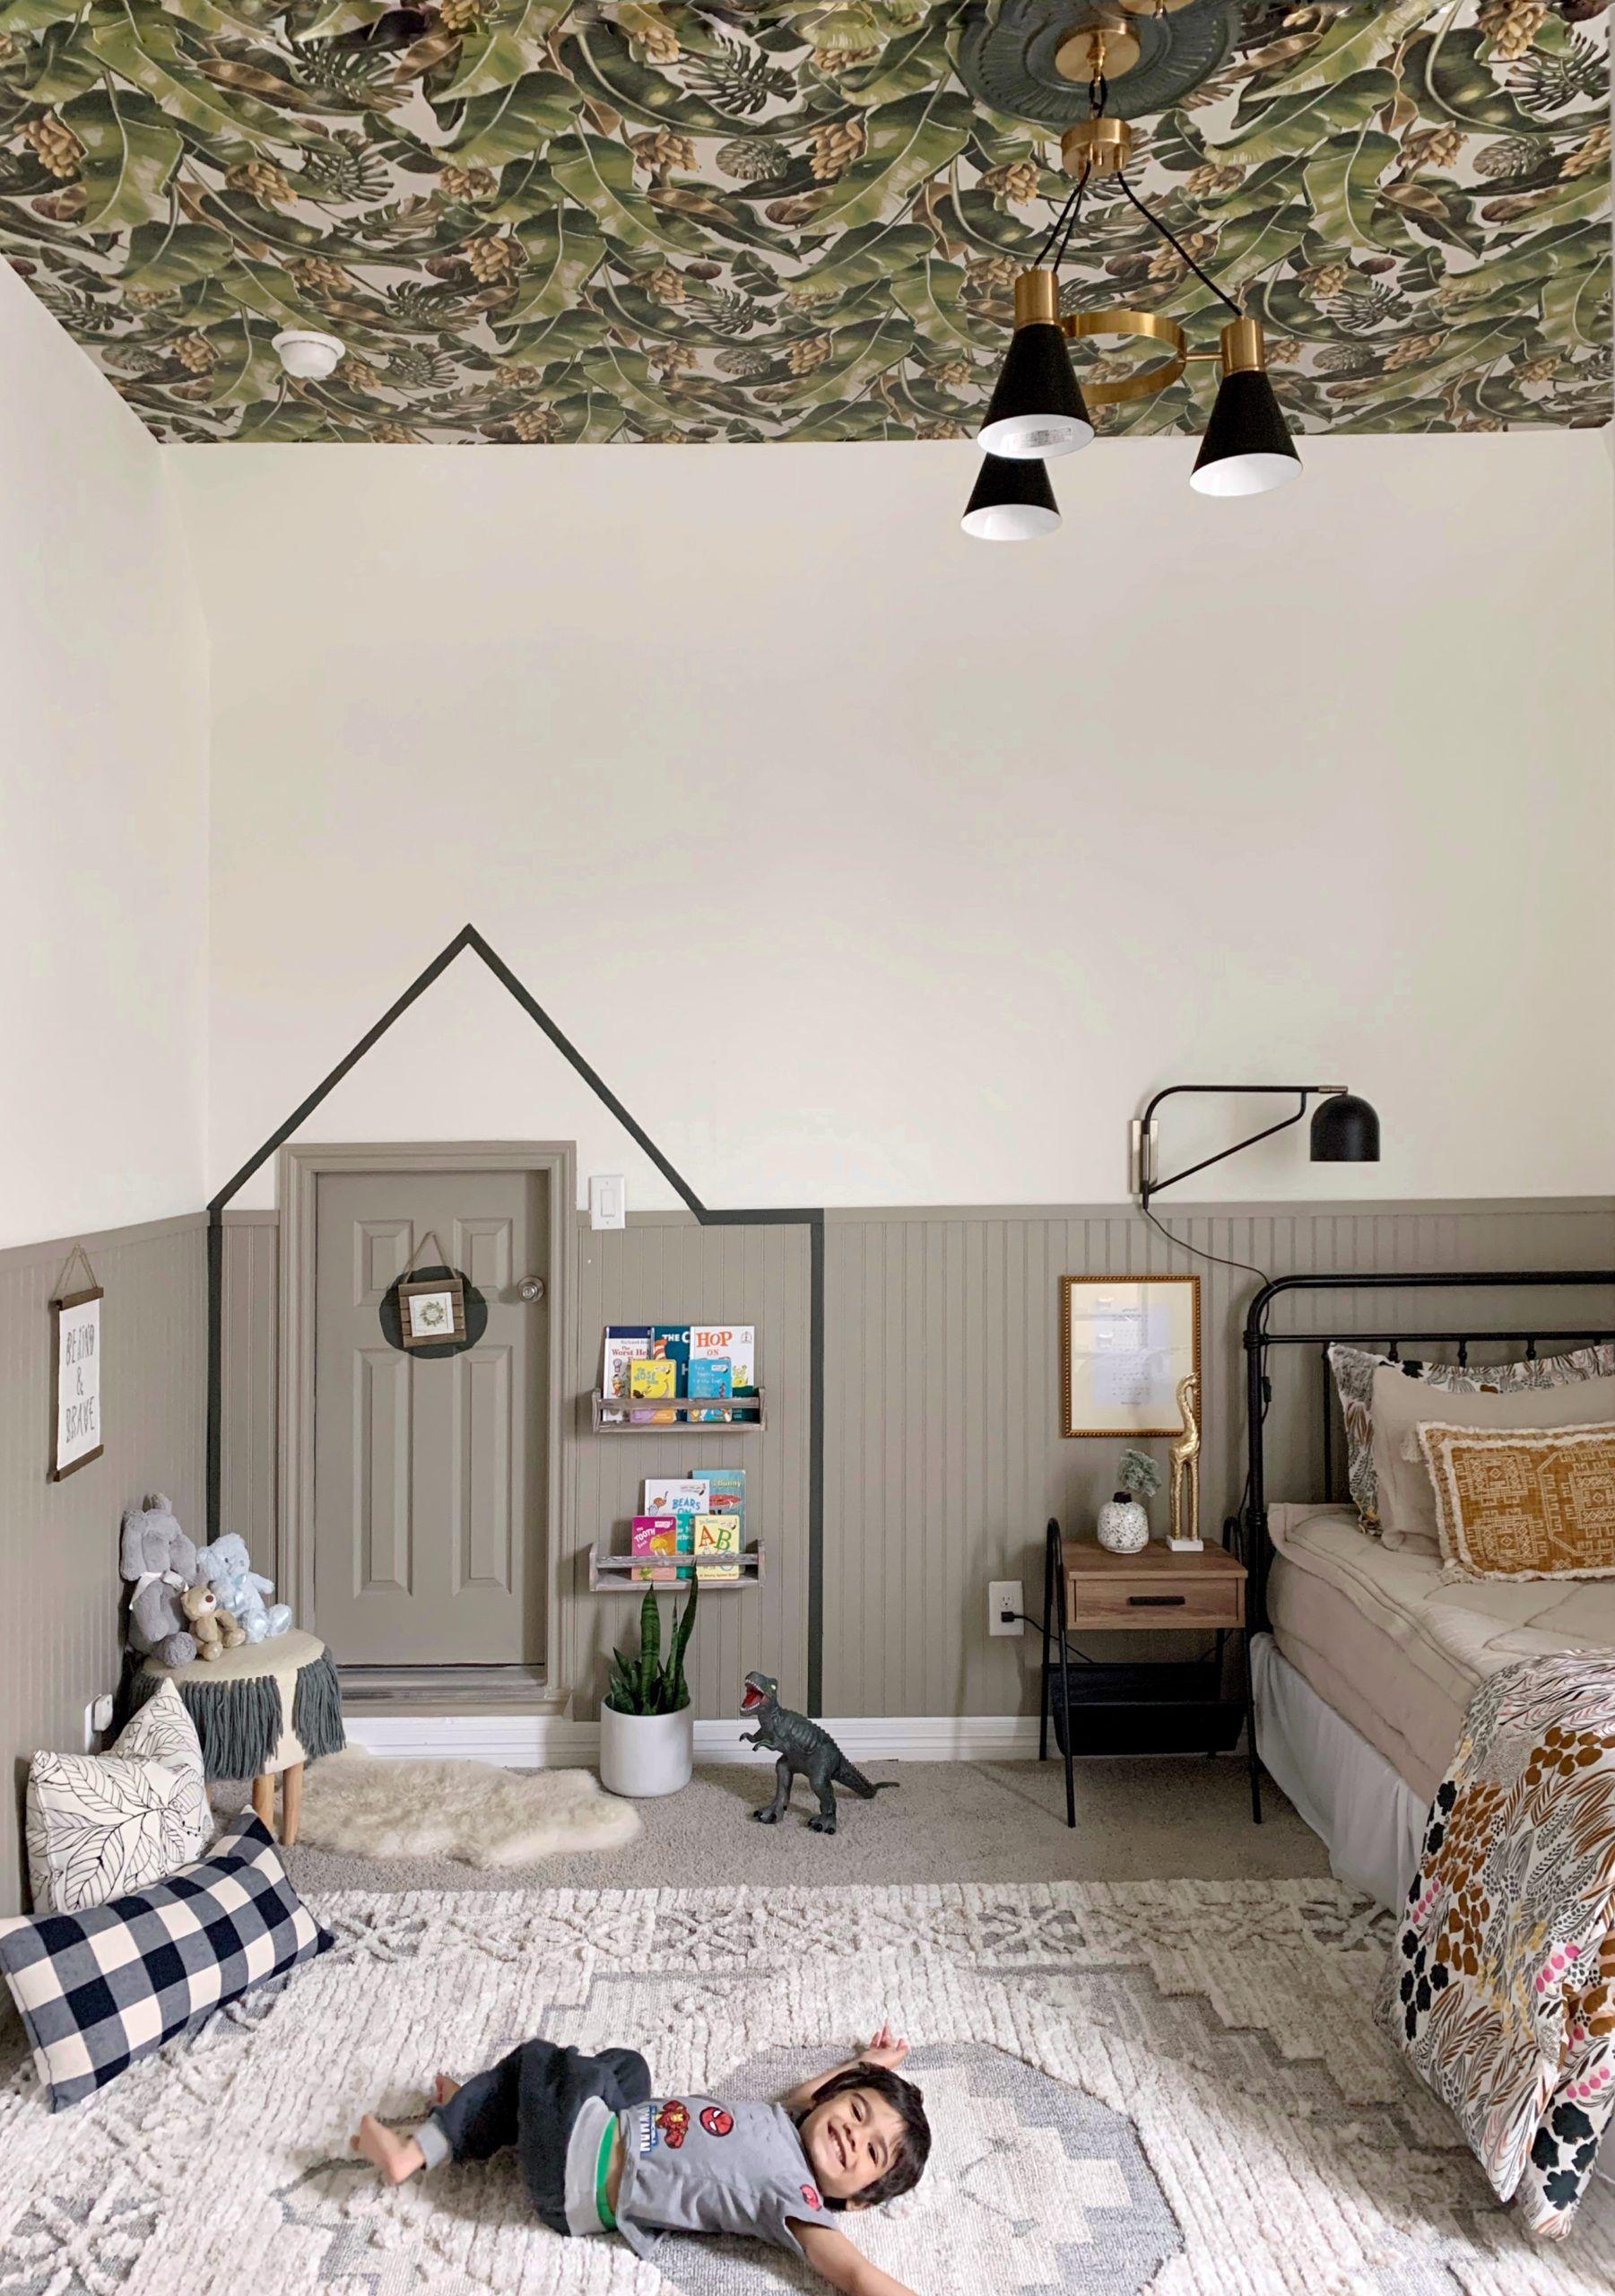 Kingdom Palm Wallpaper • Tropical Banana Leaf Wallpaper • Wallpaper on the ceiling • Boys Bedroom